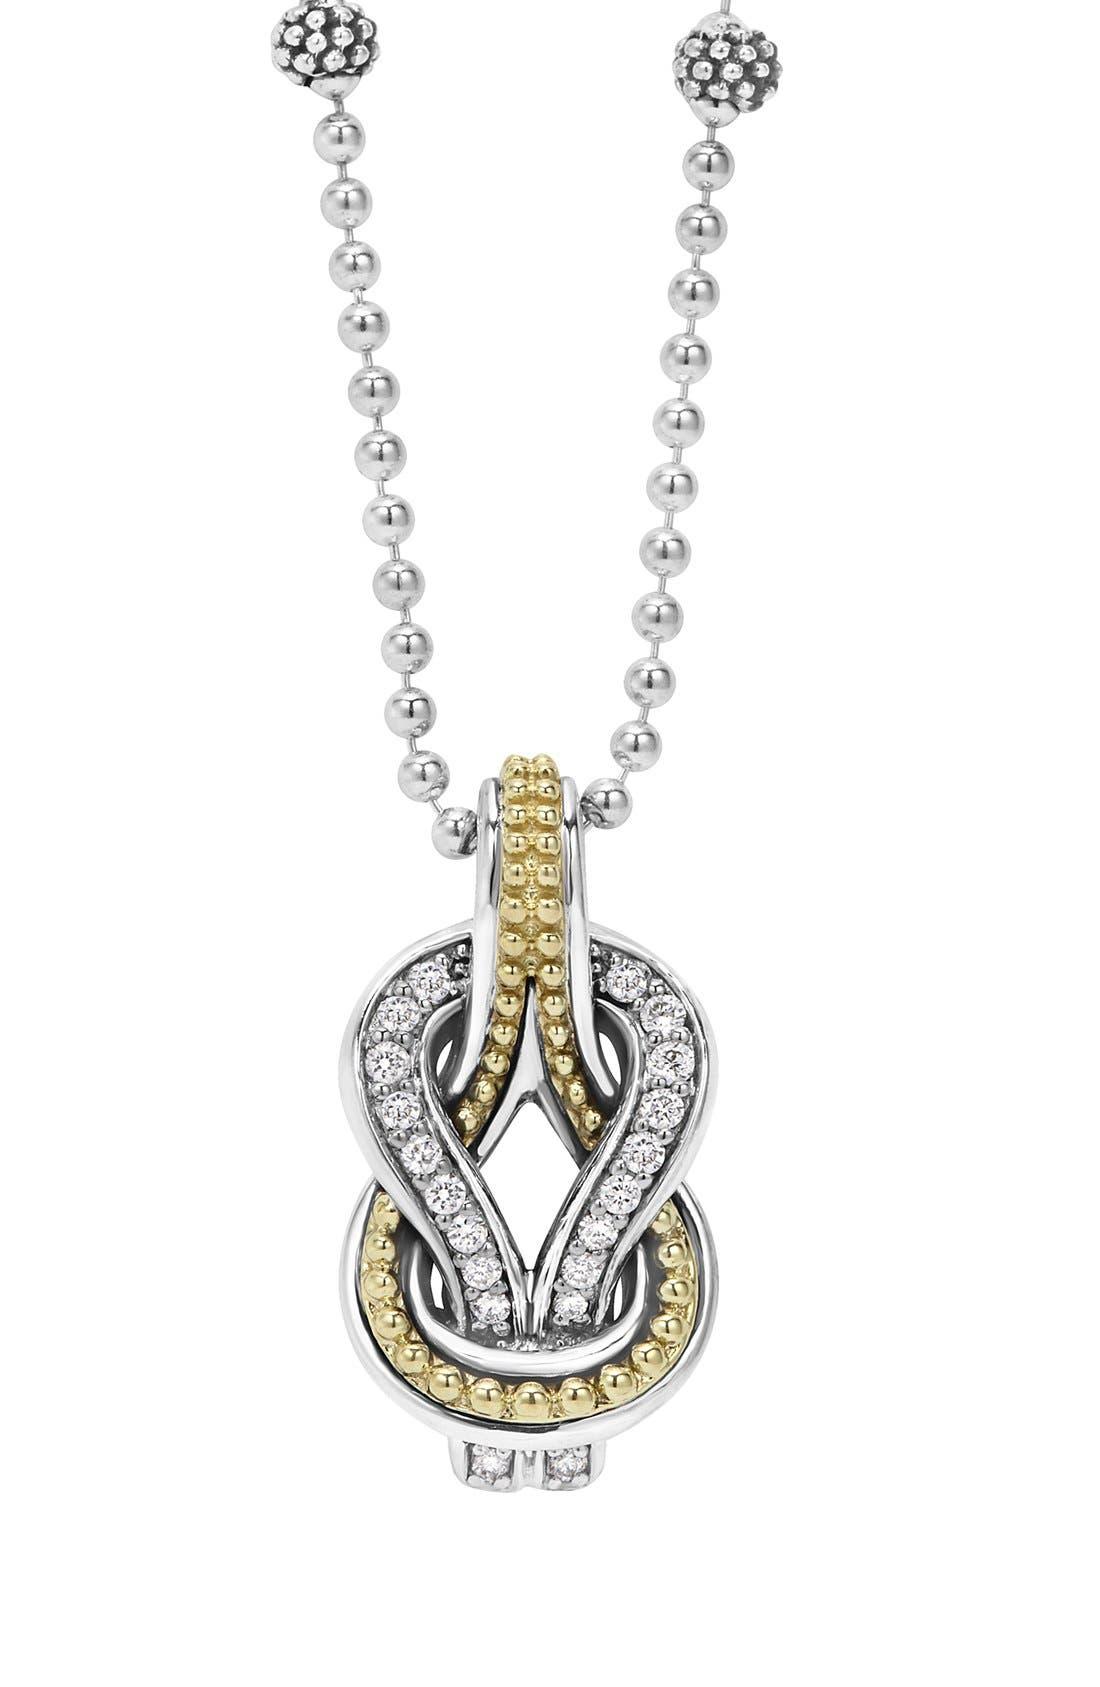 LAGOS 'Newport' Diamond Knot Pendant Necklace